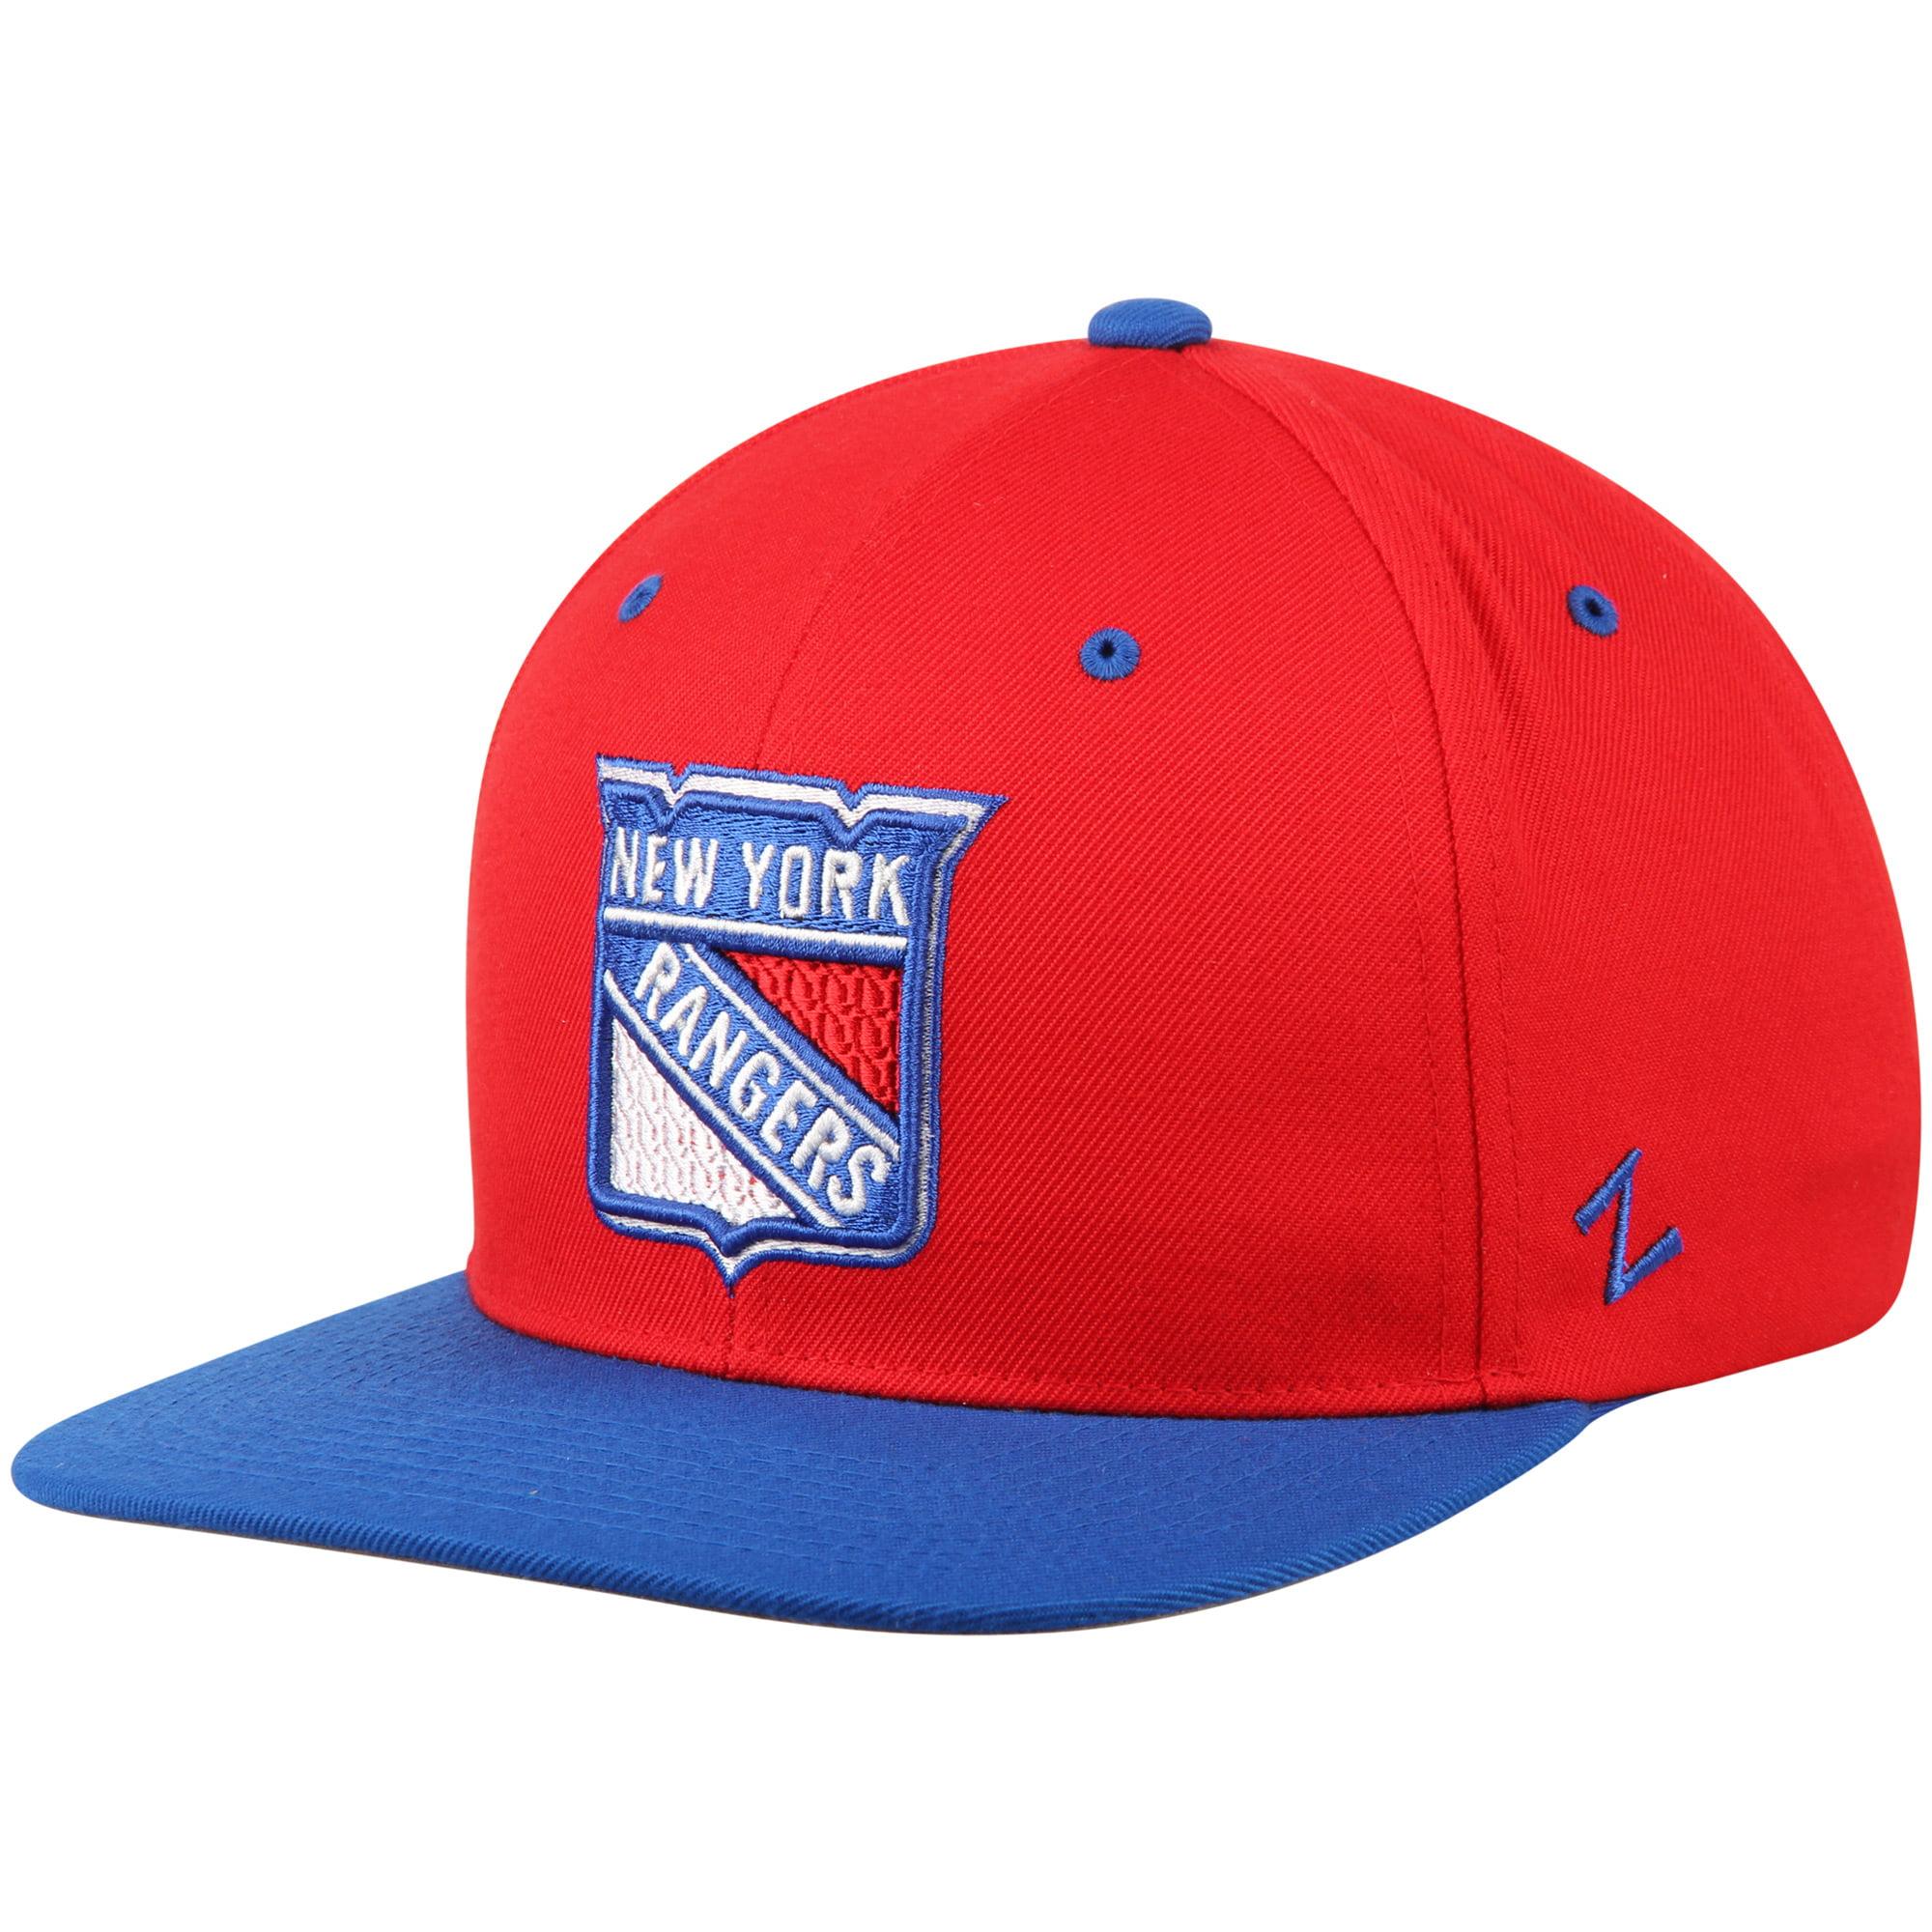 New York Rangers Zephyr Z11 Snapback Adjustable Hat - Red/Blue - OSFA